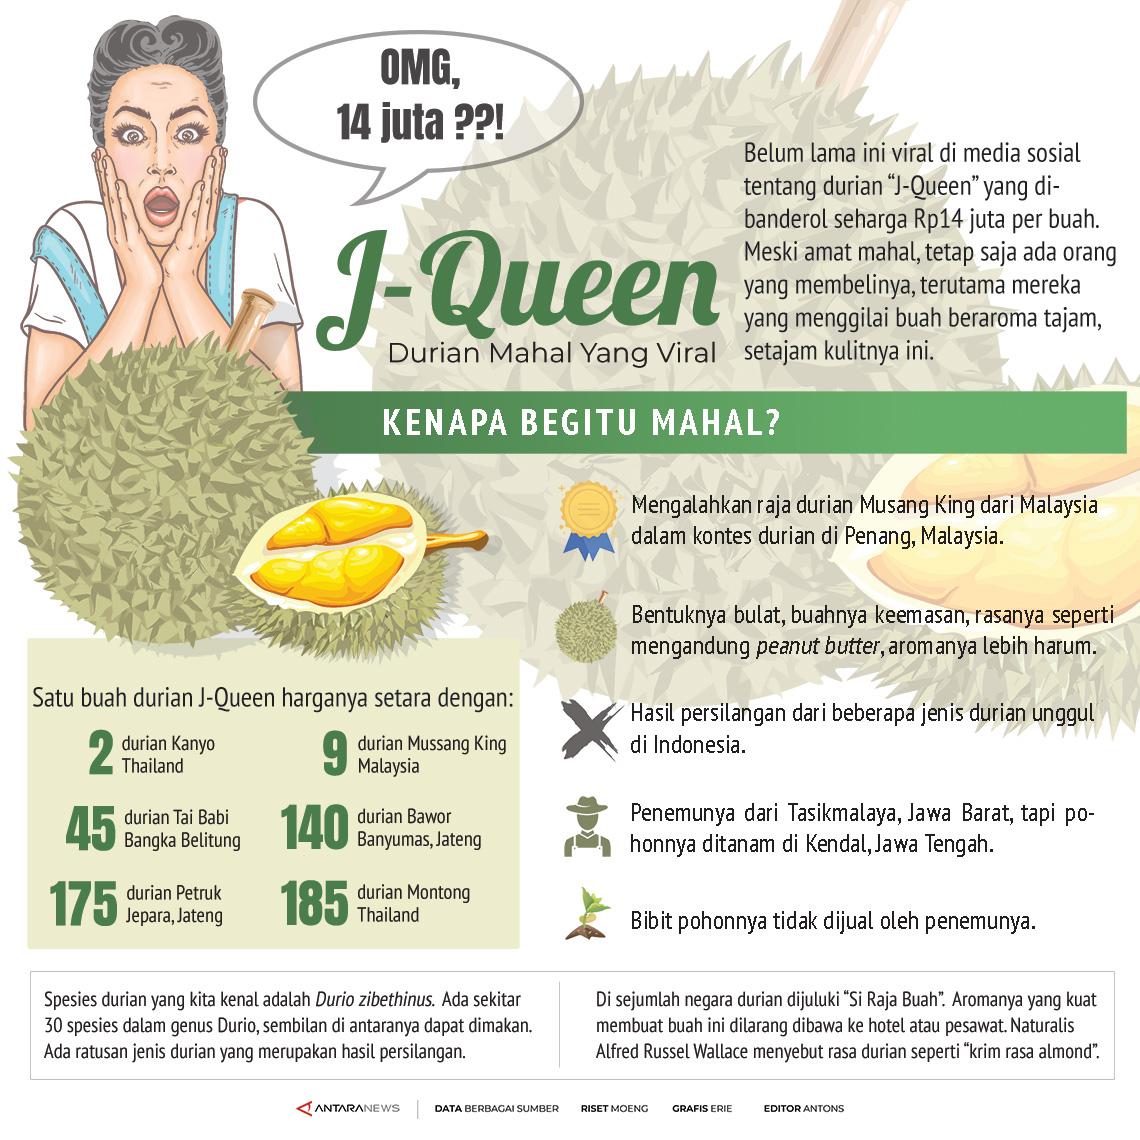 J-Queen, durian mahal yang viral